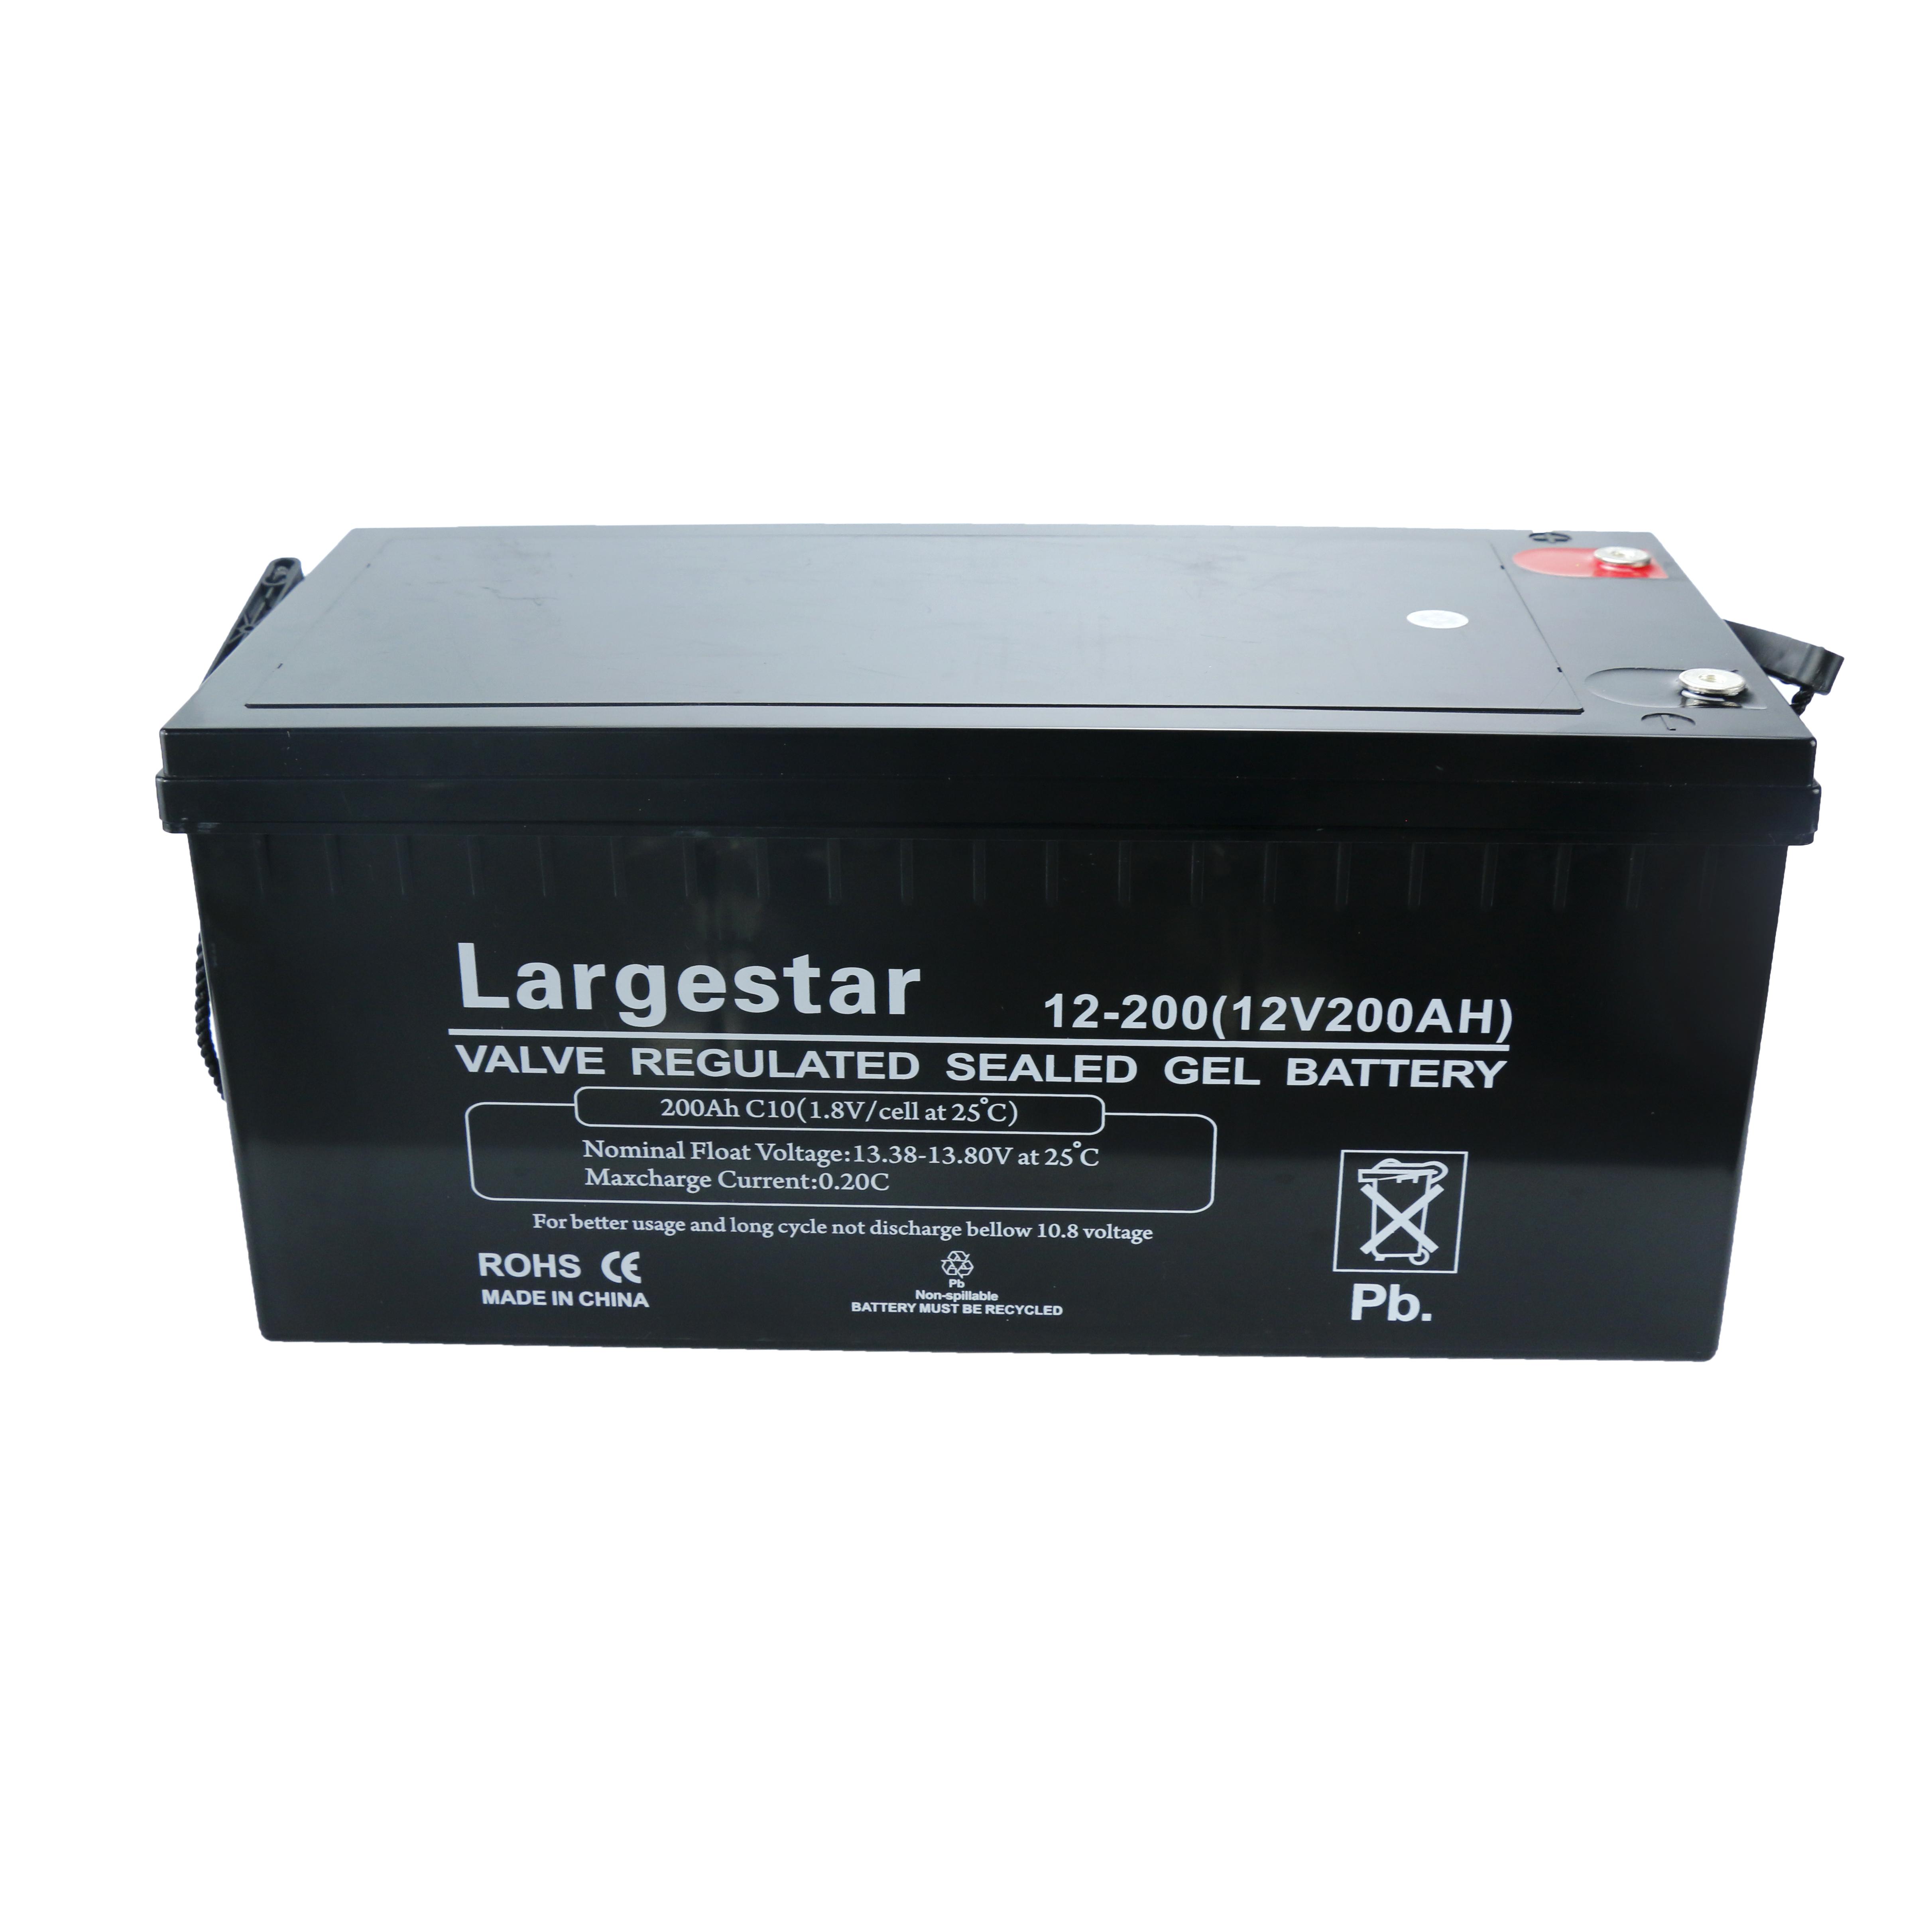 12v 200ah lead acid deep cycle solar power storage battery